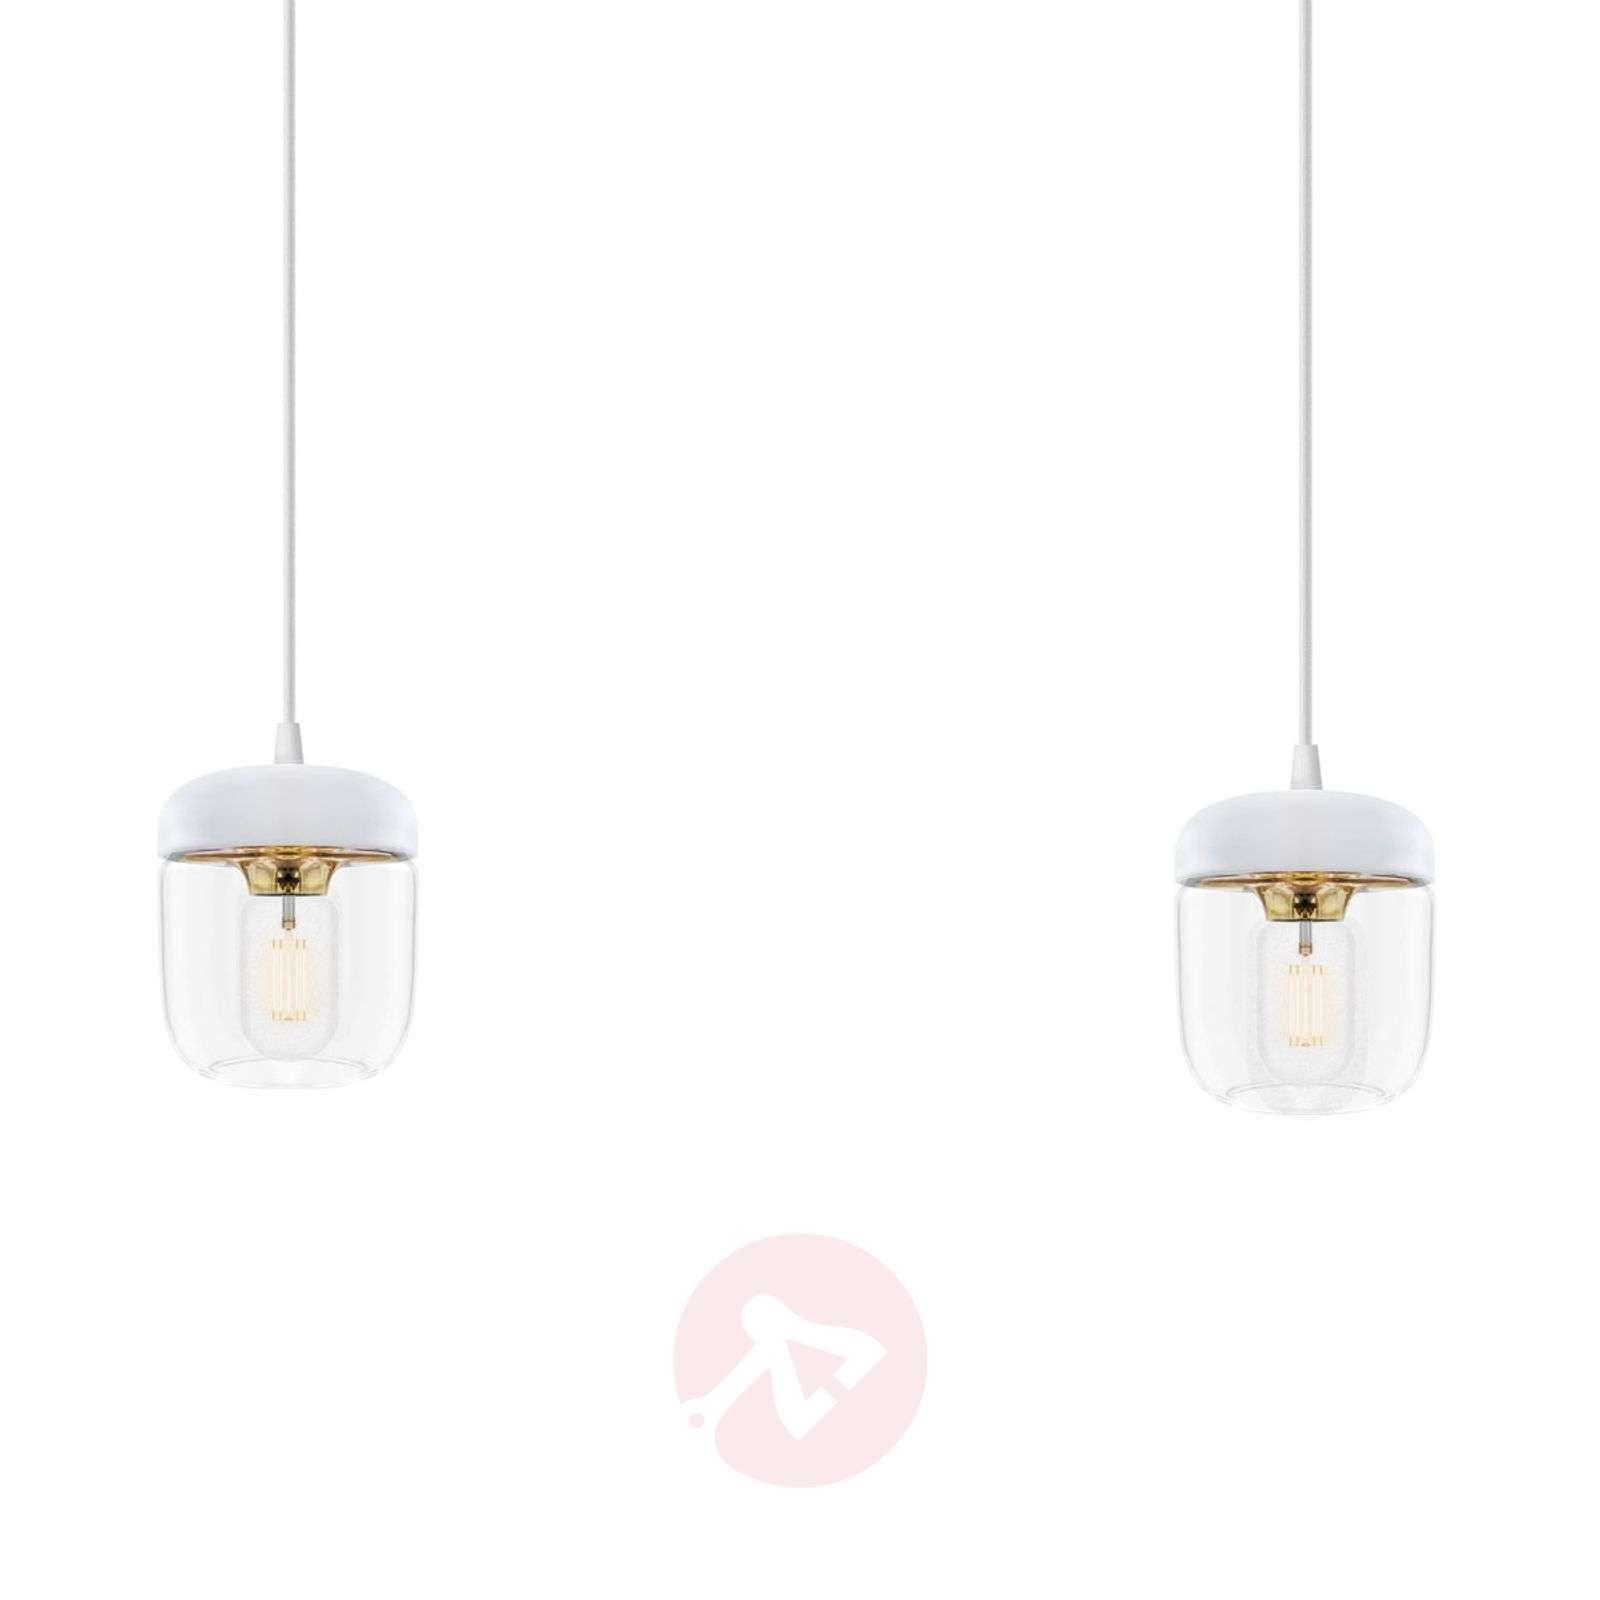 UMAGE Acorn hanging lamp two-bulb, white/brass-9521085-01